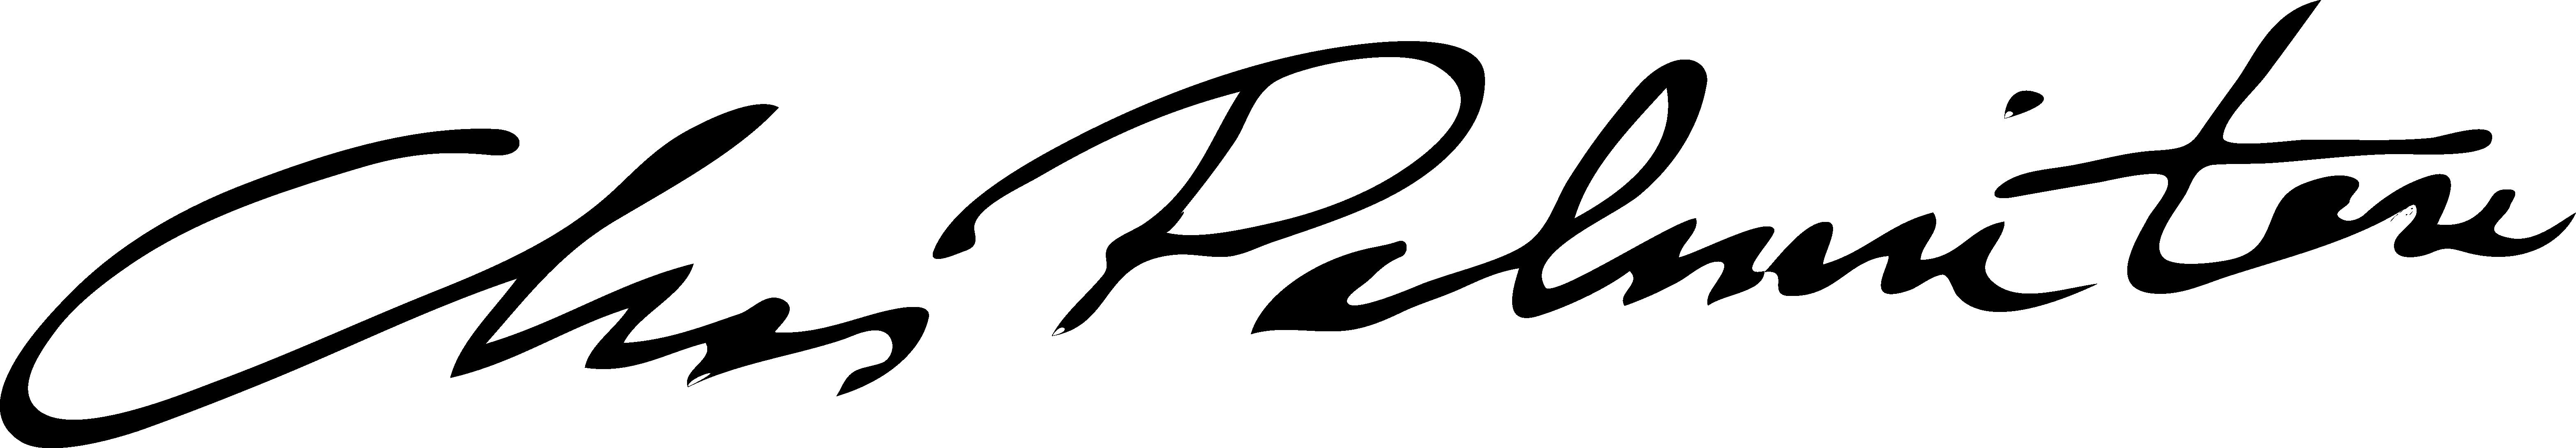 Chas Palminteri Signature